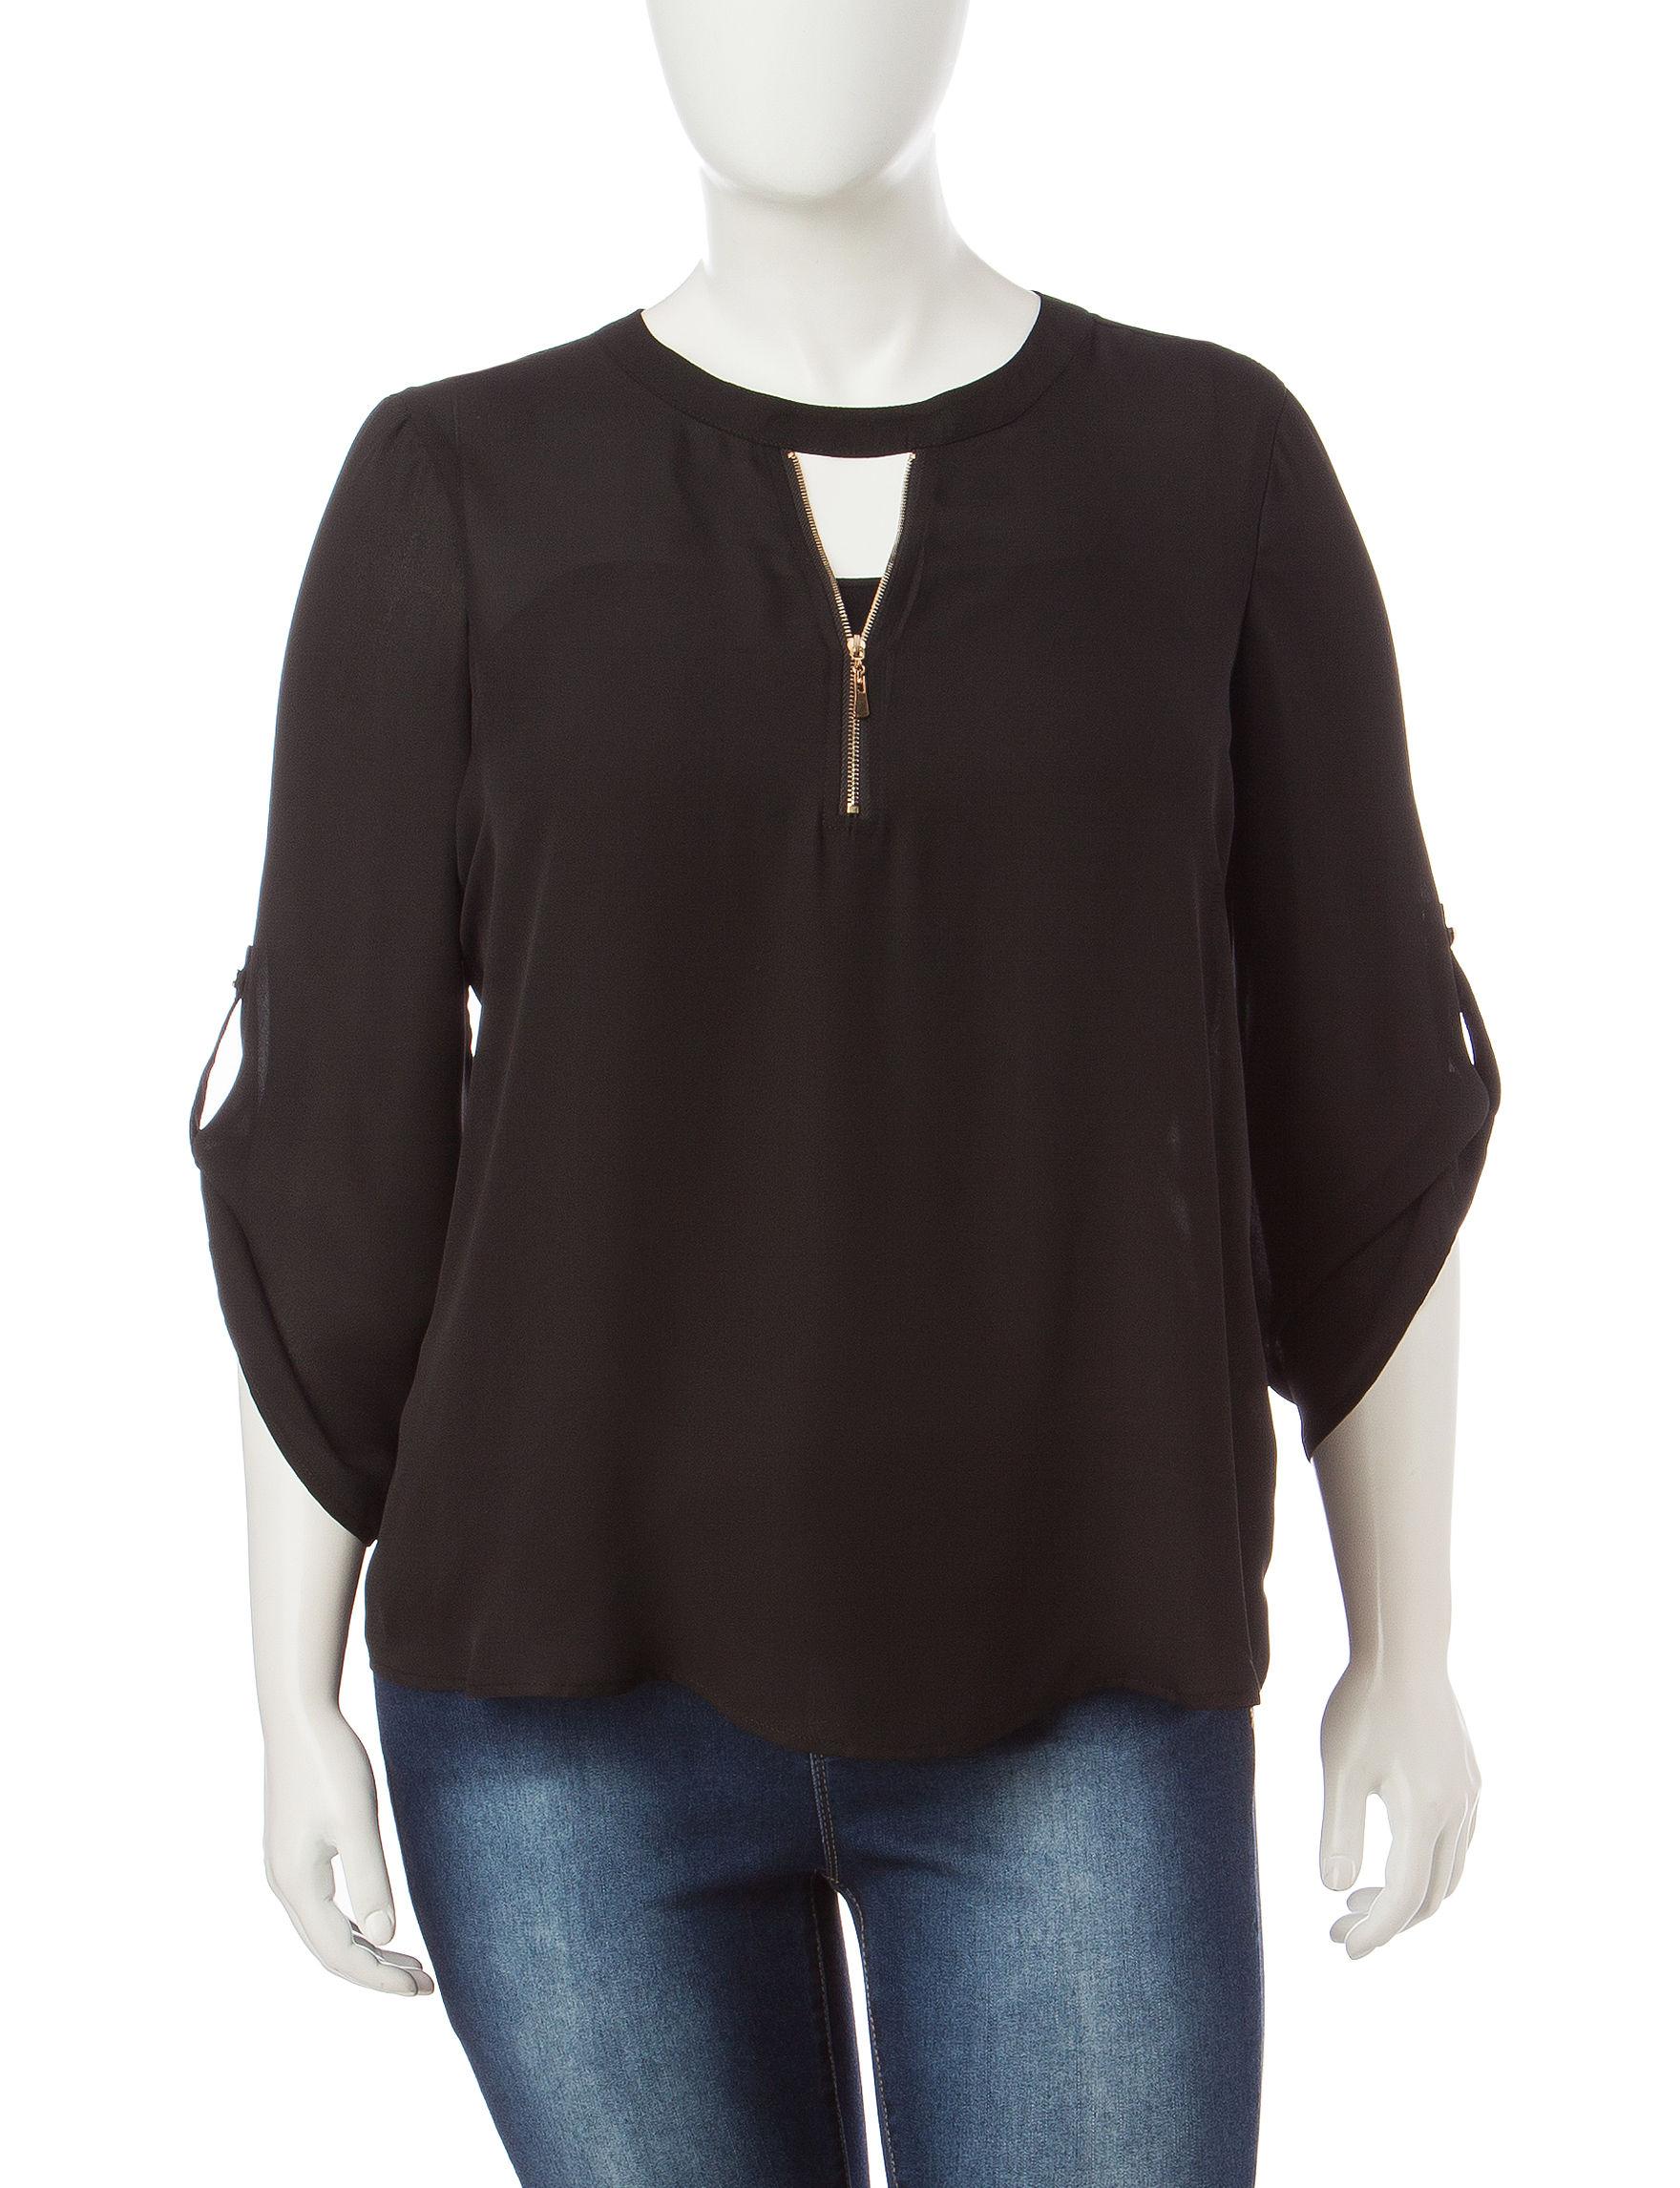 Justify Black Multi Shirts & Blouses